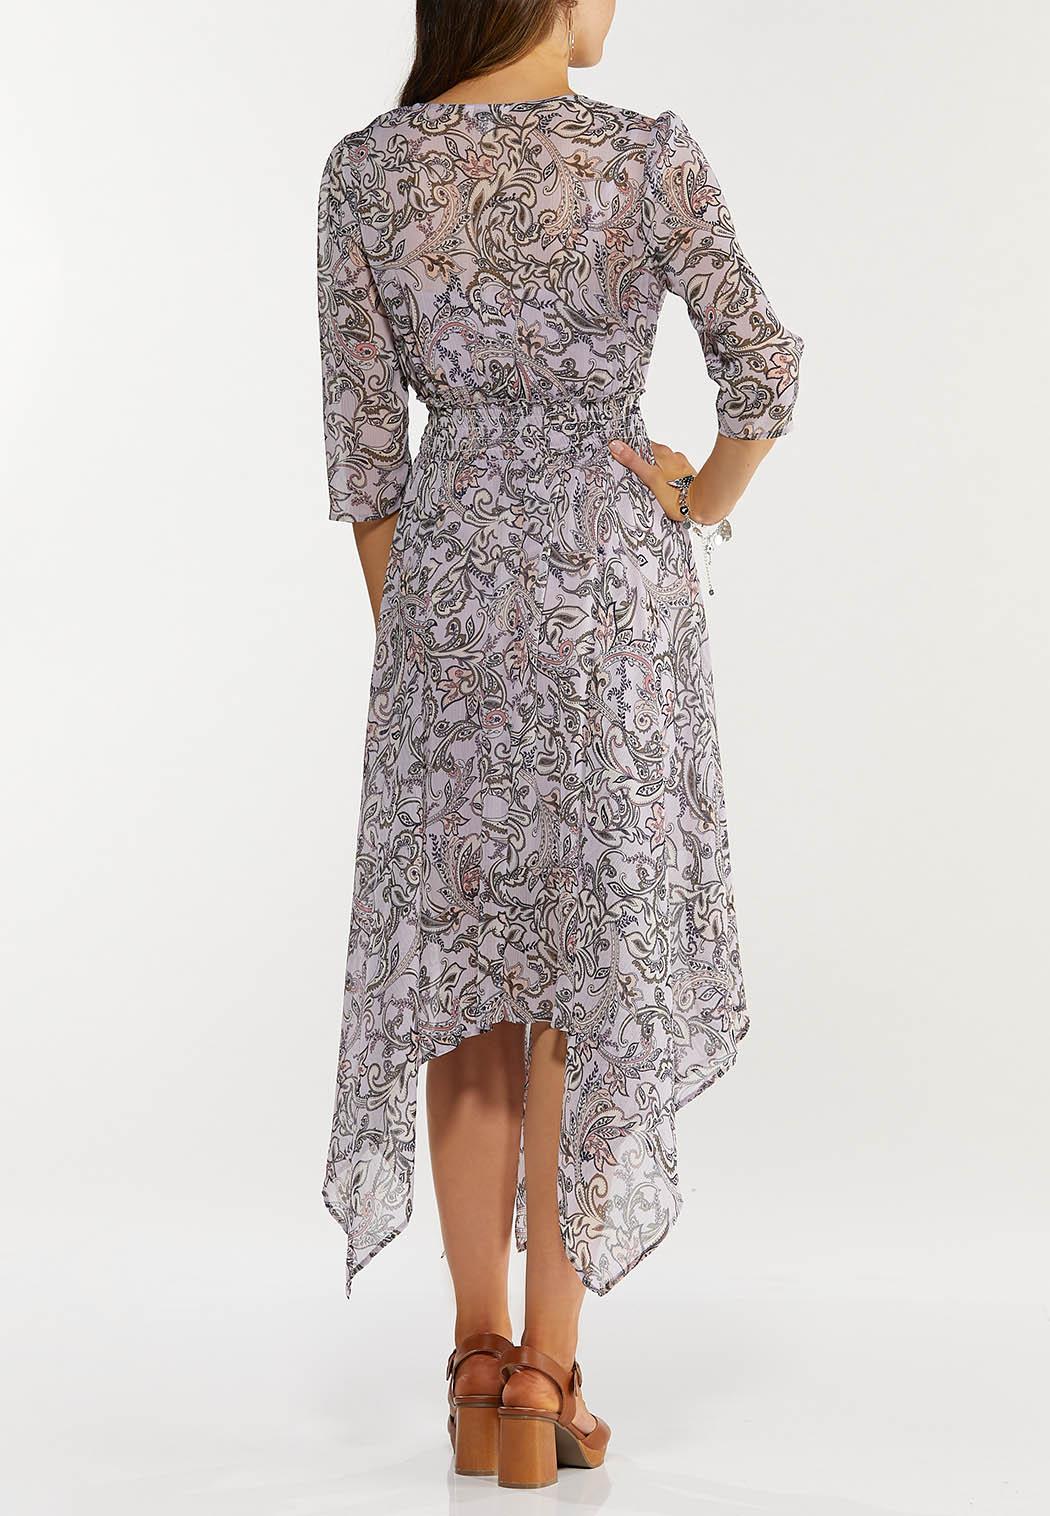 Plus Size Smocked Paisley Hanky Hem Dress (Item #44489179)